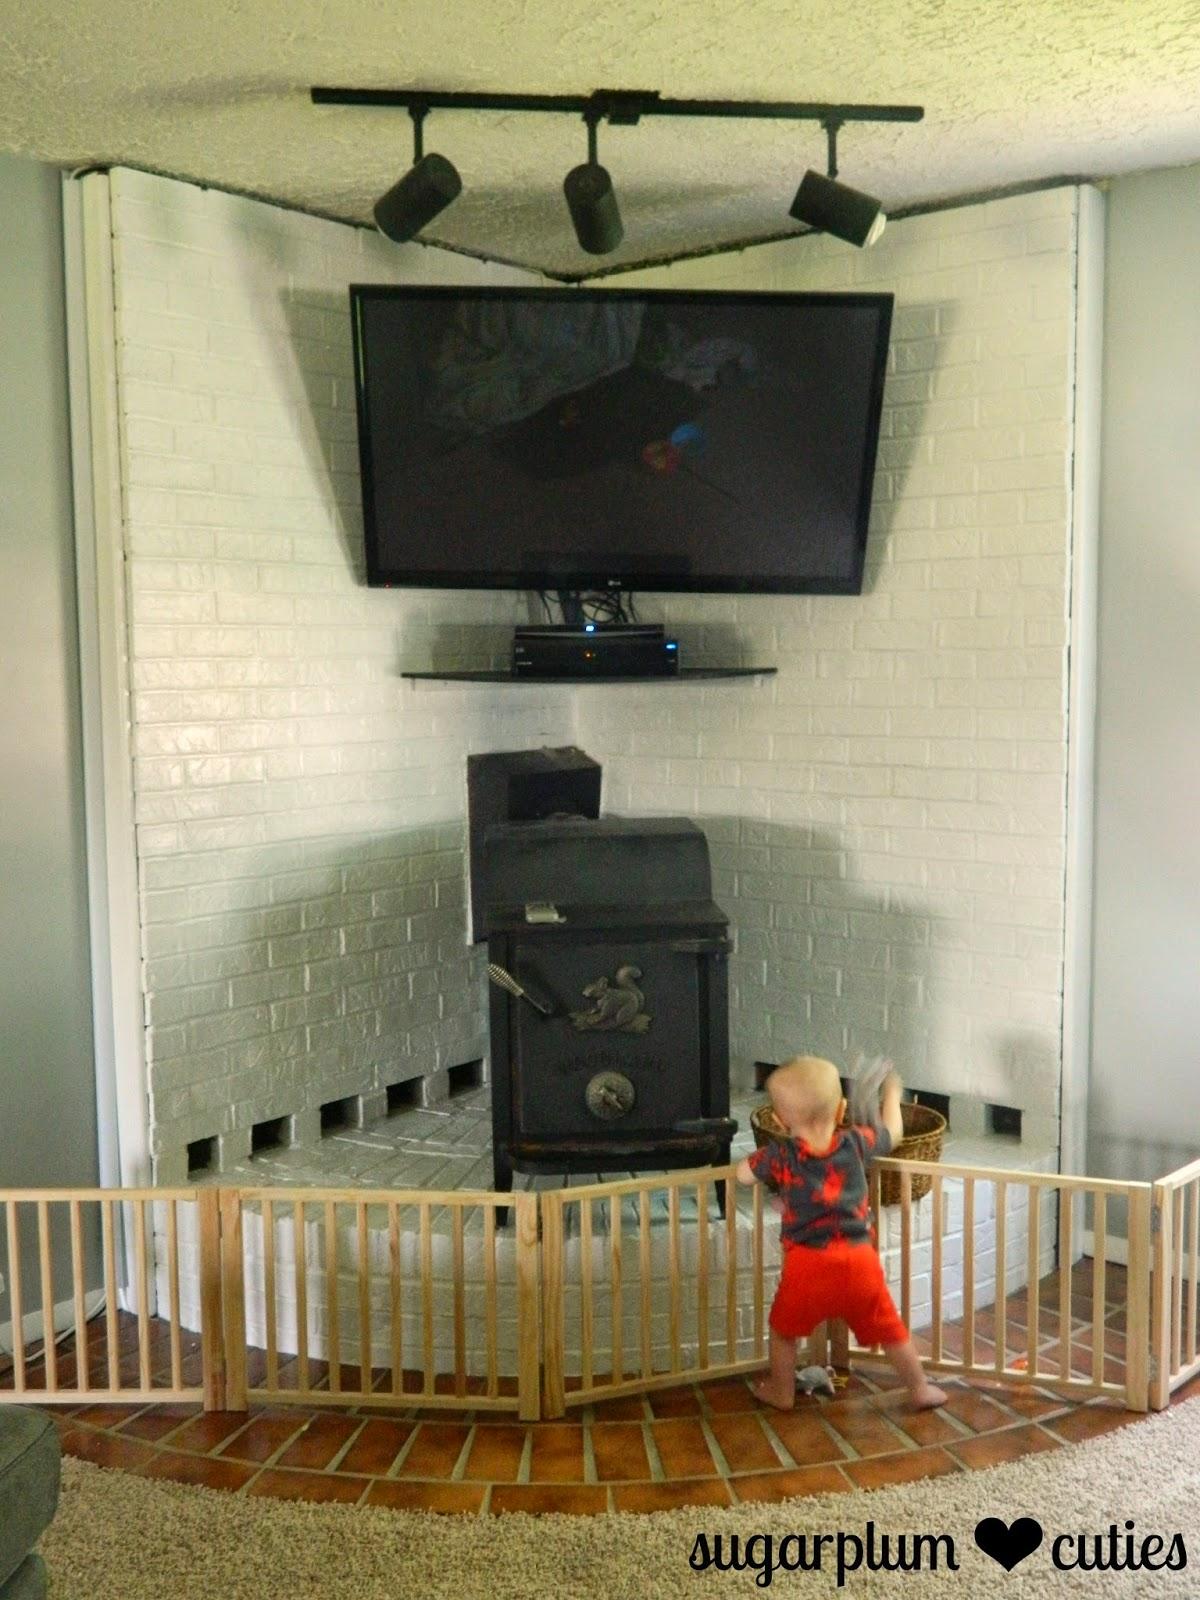 Sugarplum Cuties: Painting a Brick Fireplace